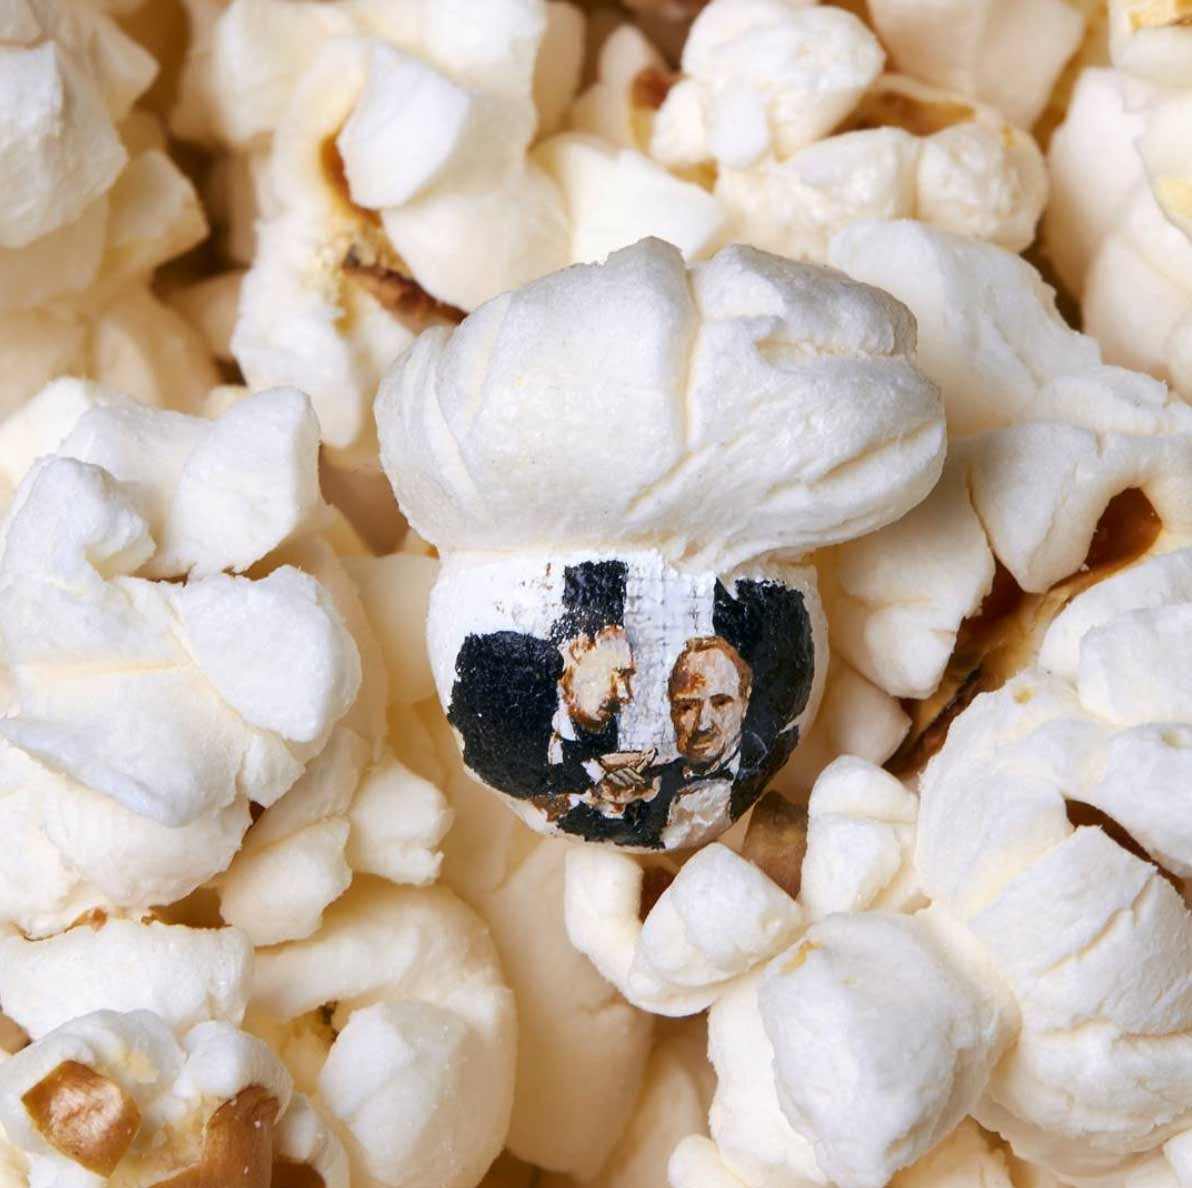 Filmmotive auf Popcorn gemalt Hasan-Kale-popcornmalerei_02